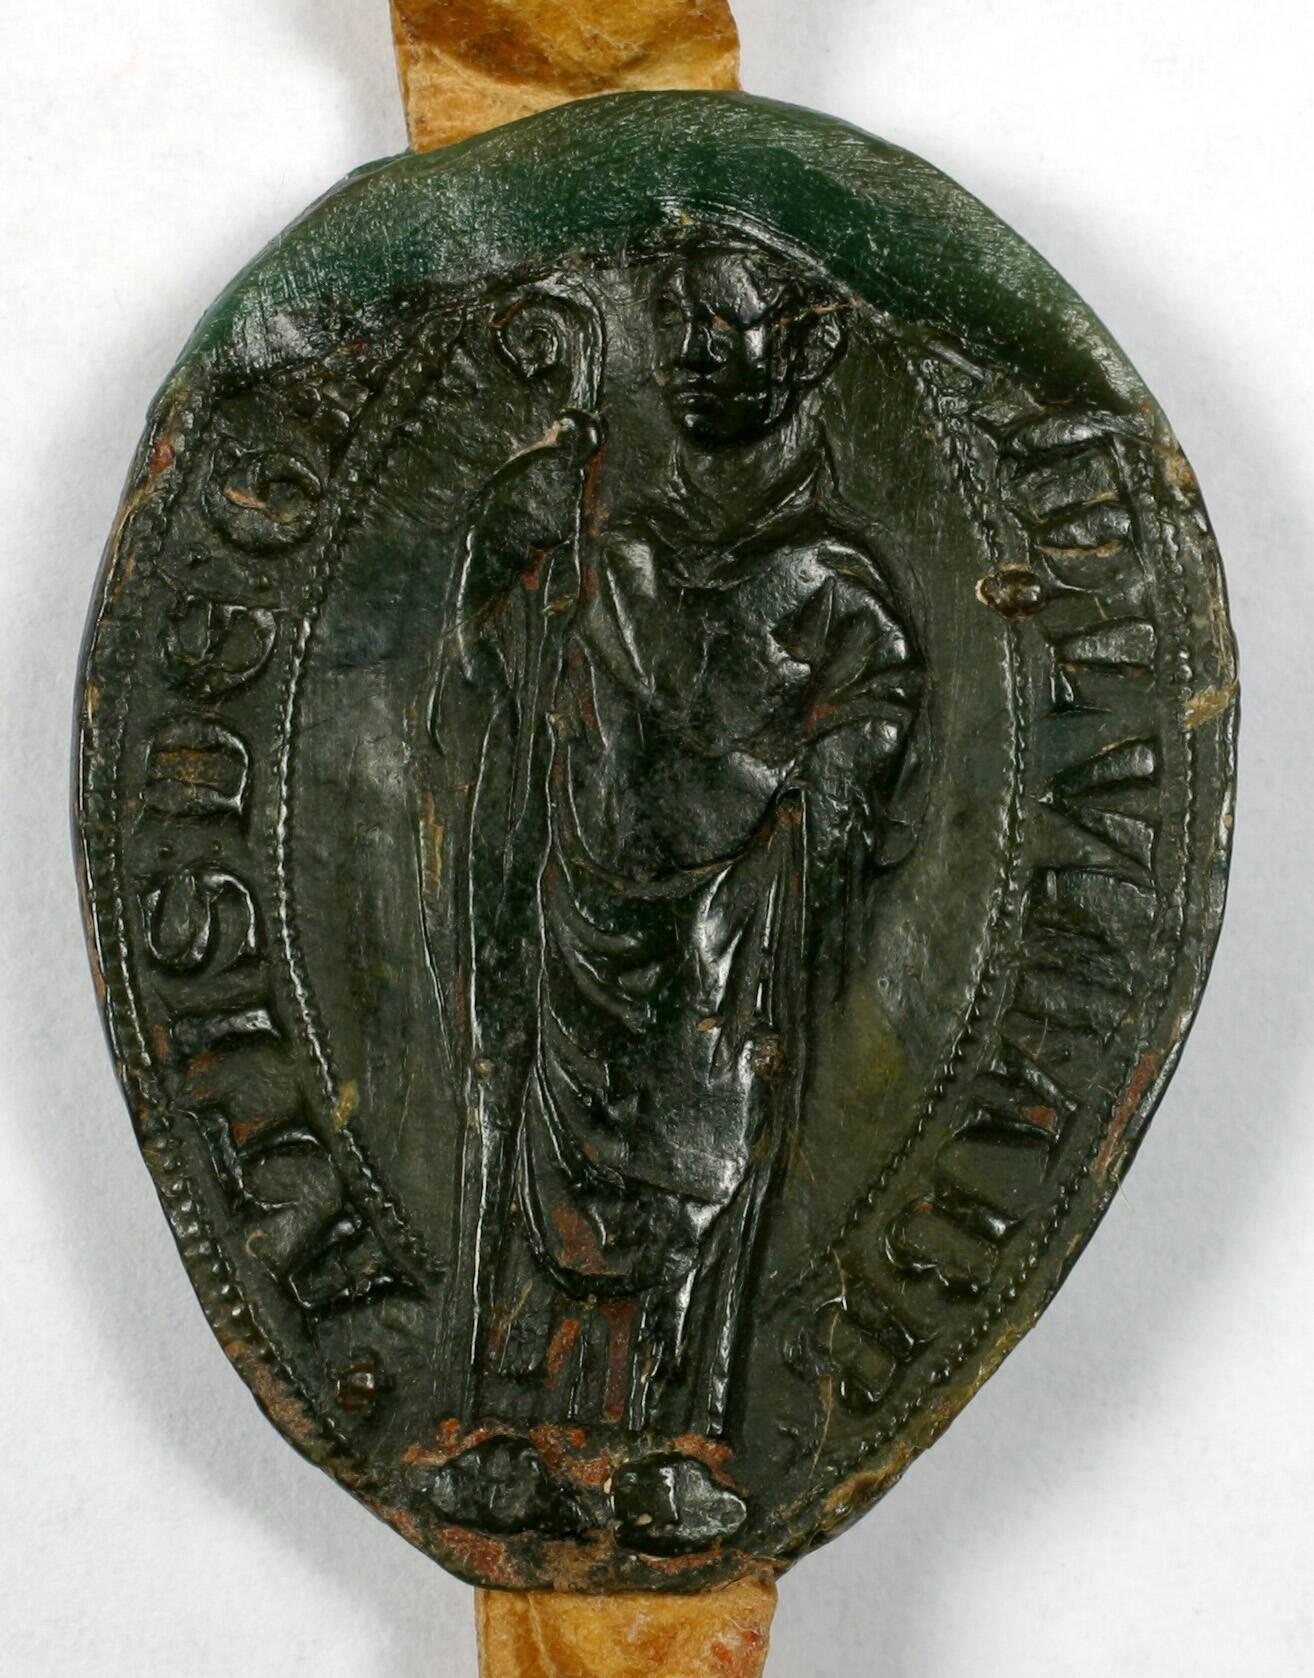 Sceau - L'abbé du Gard